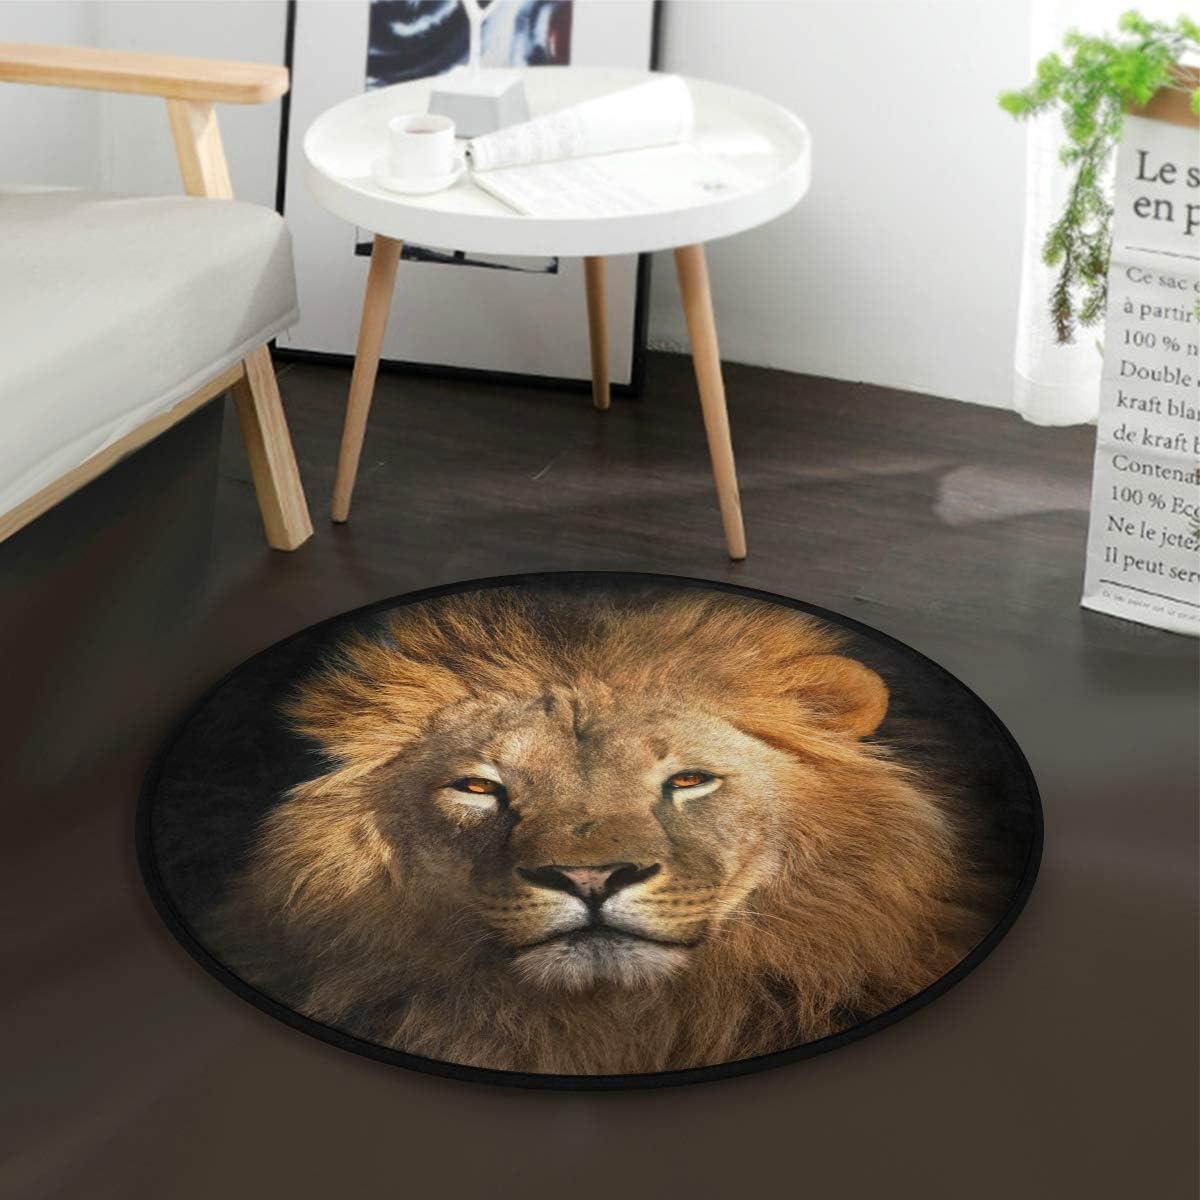 Lion King Cosmic Space Floor Area Rug Home Decor Carpet Crawling Mat Yoga Rug